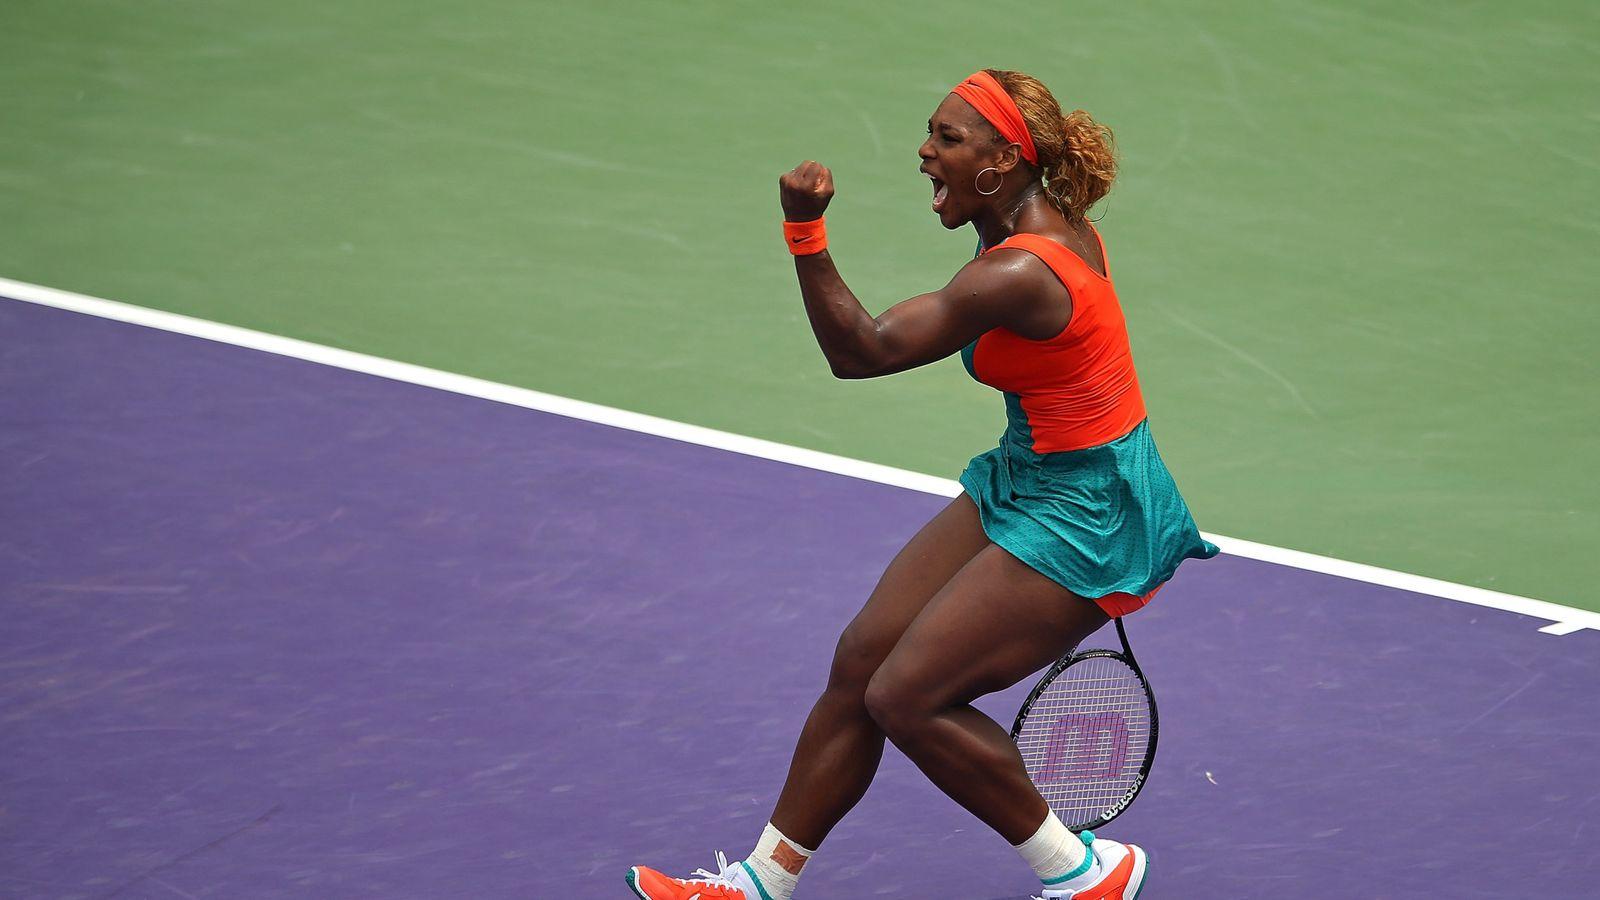 WTA: Serena Williams beats Li Na, claims title | Tennis